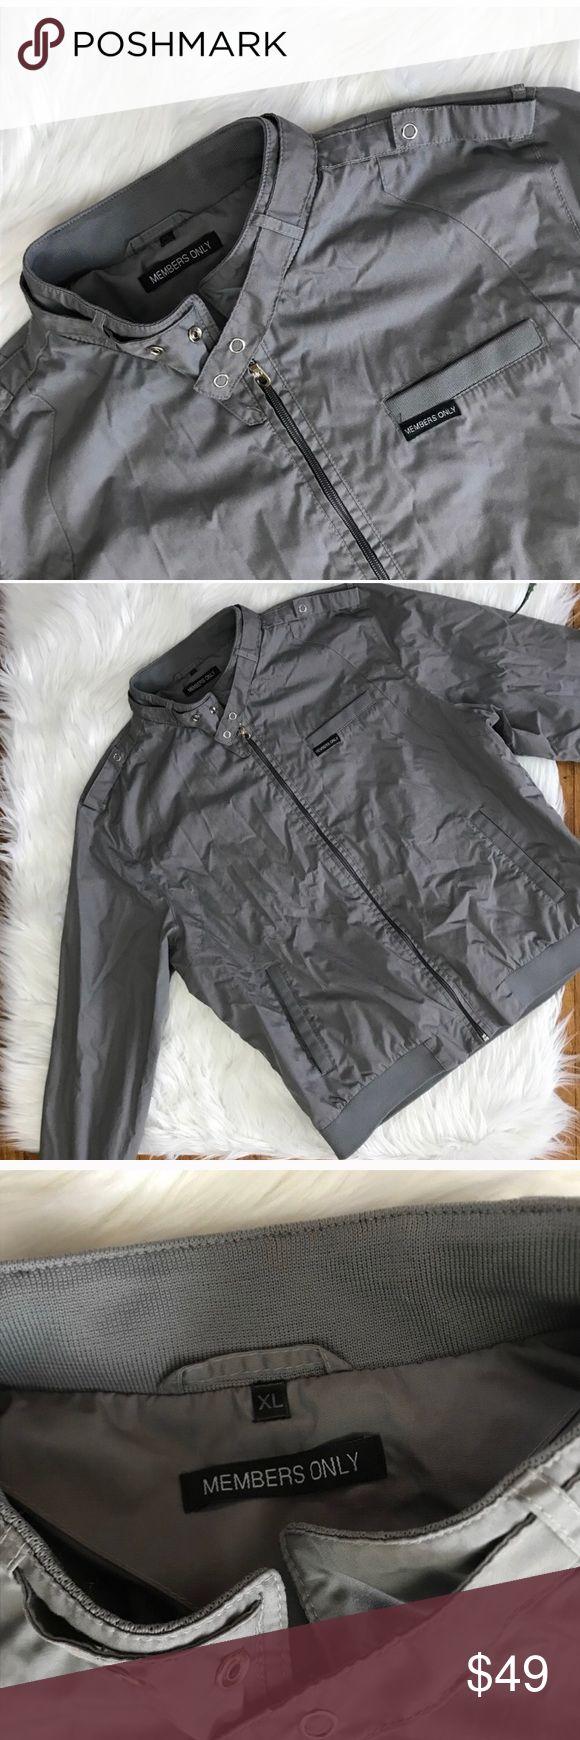 Members Only Grey Bomber Jacket A Members Only Jackets & Coats Bomber & Varsity